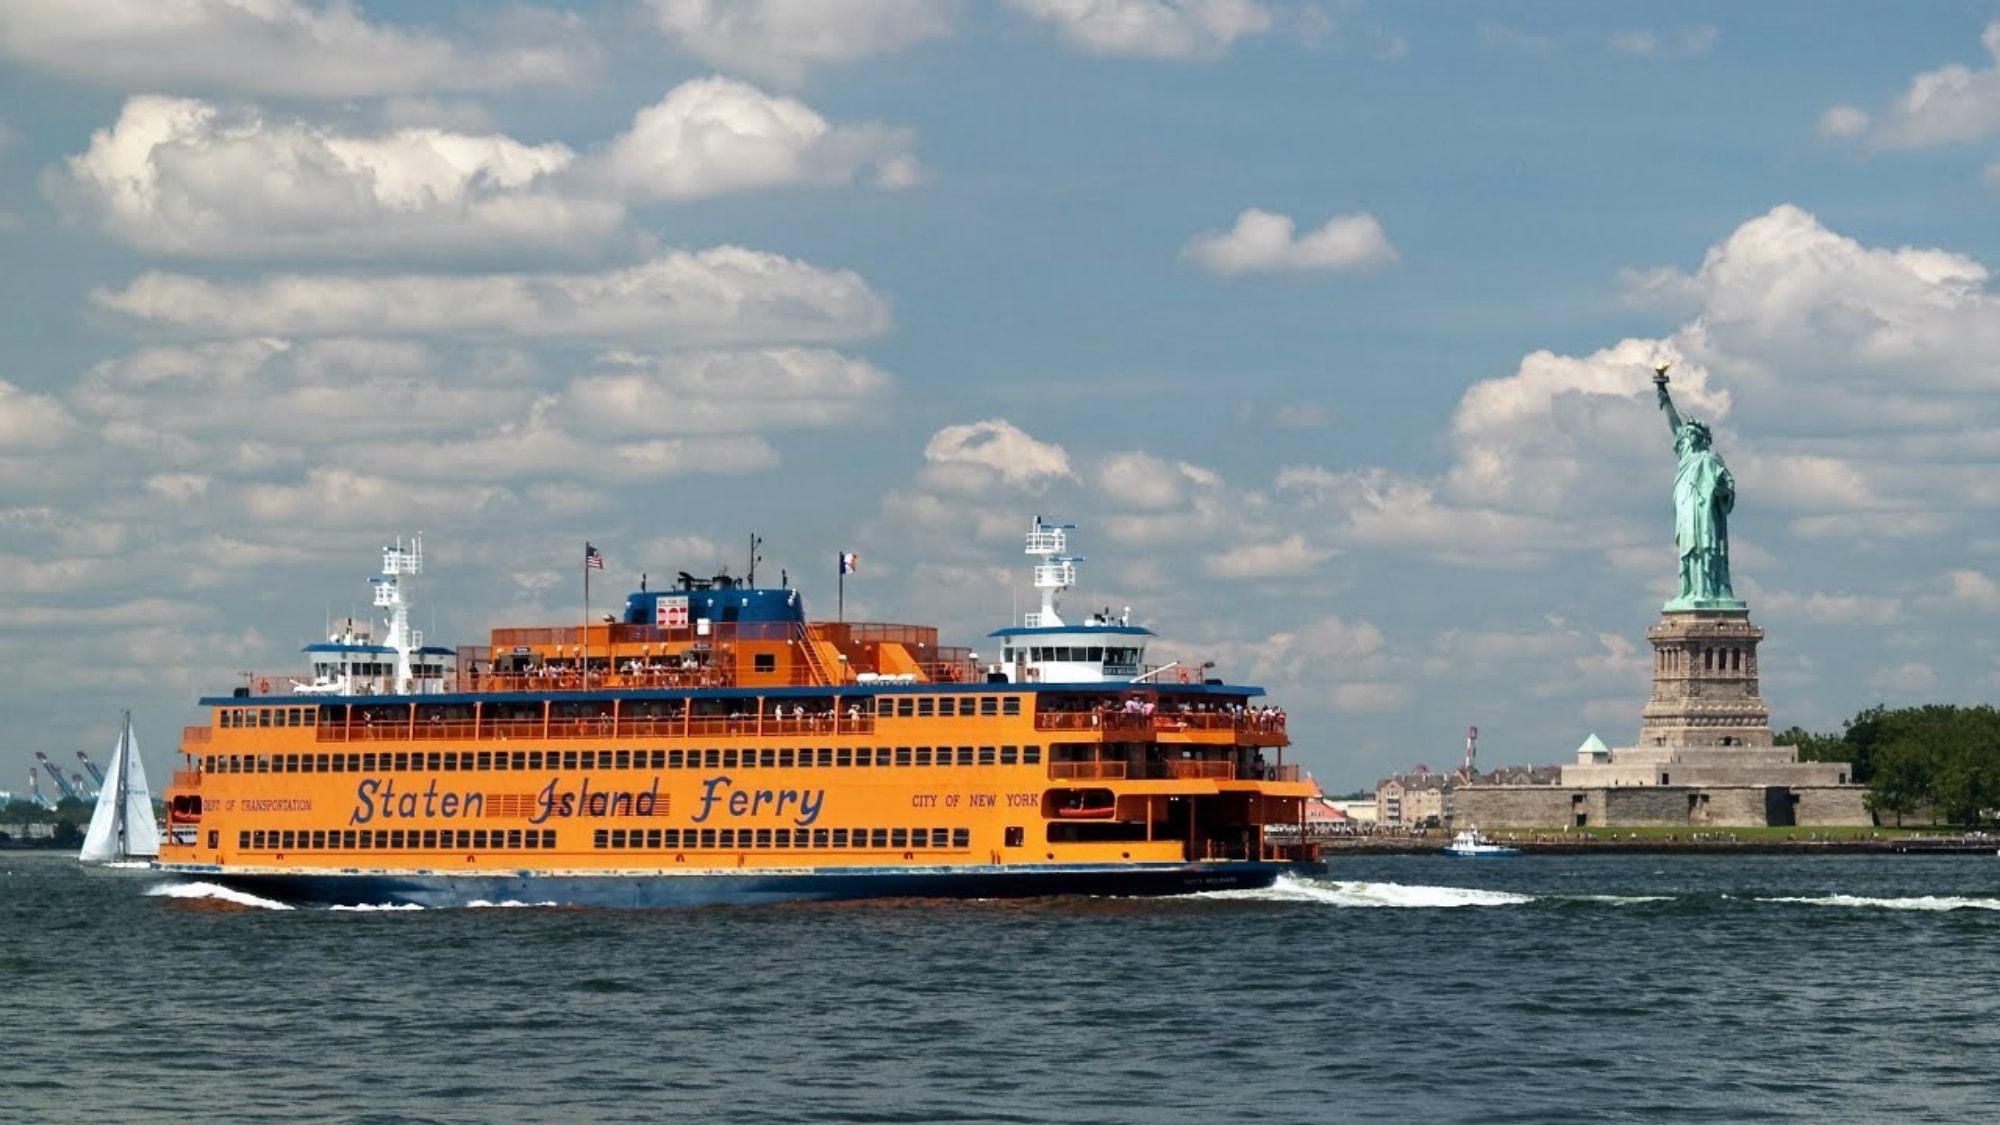 Getting to Staten Island, New York